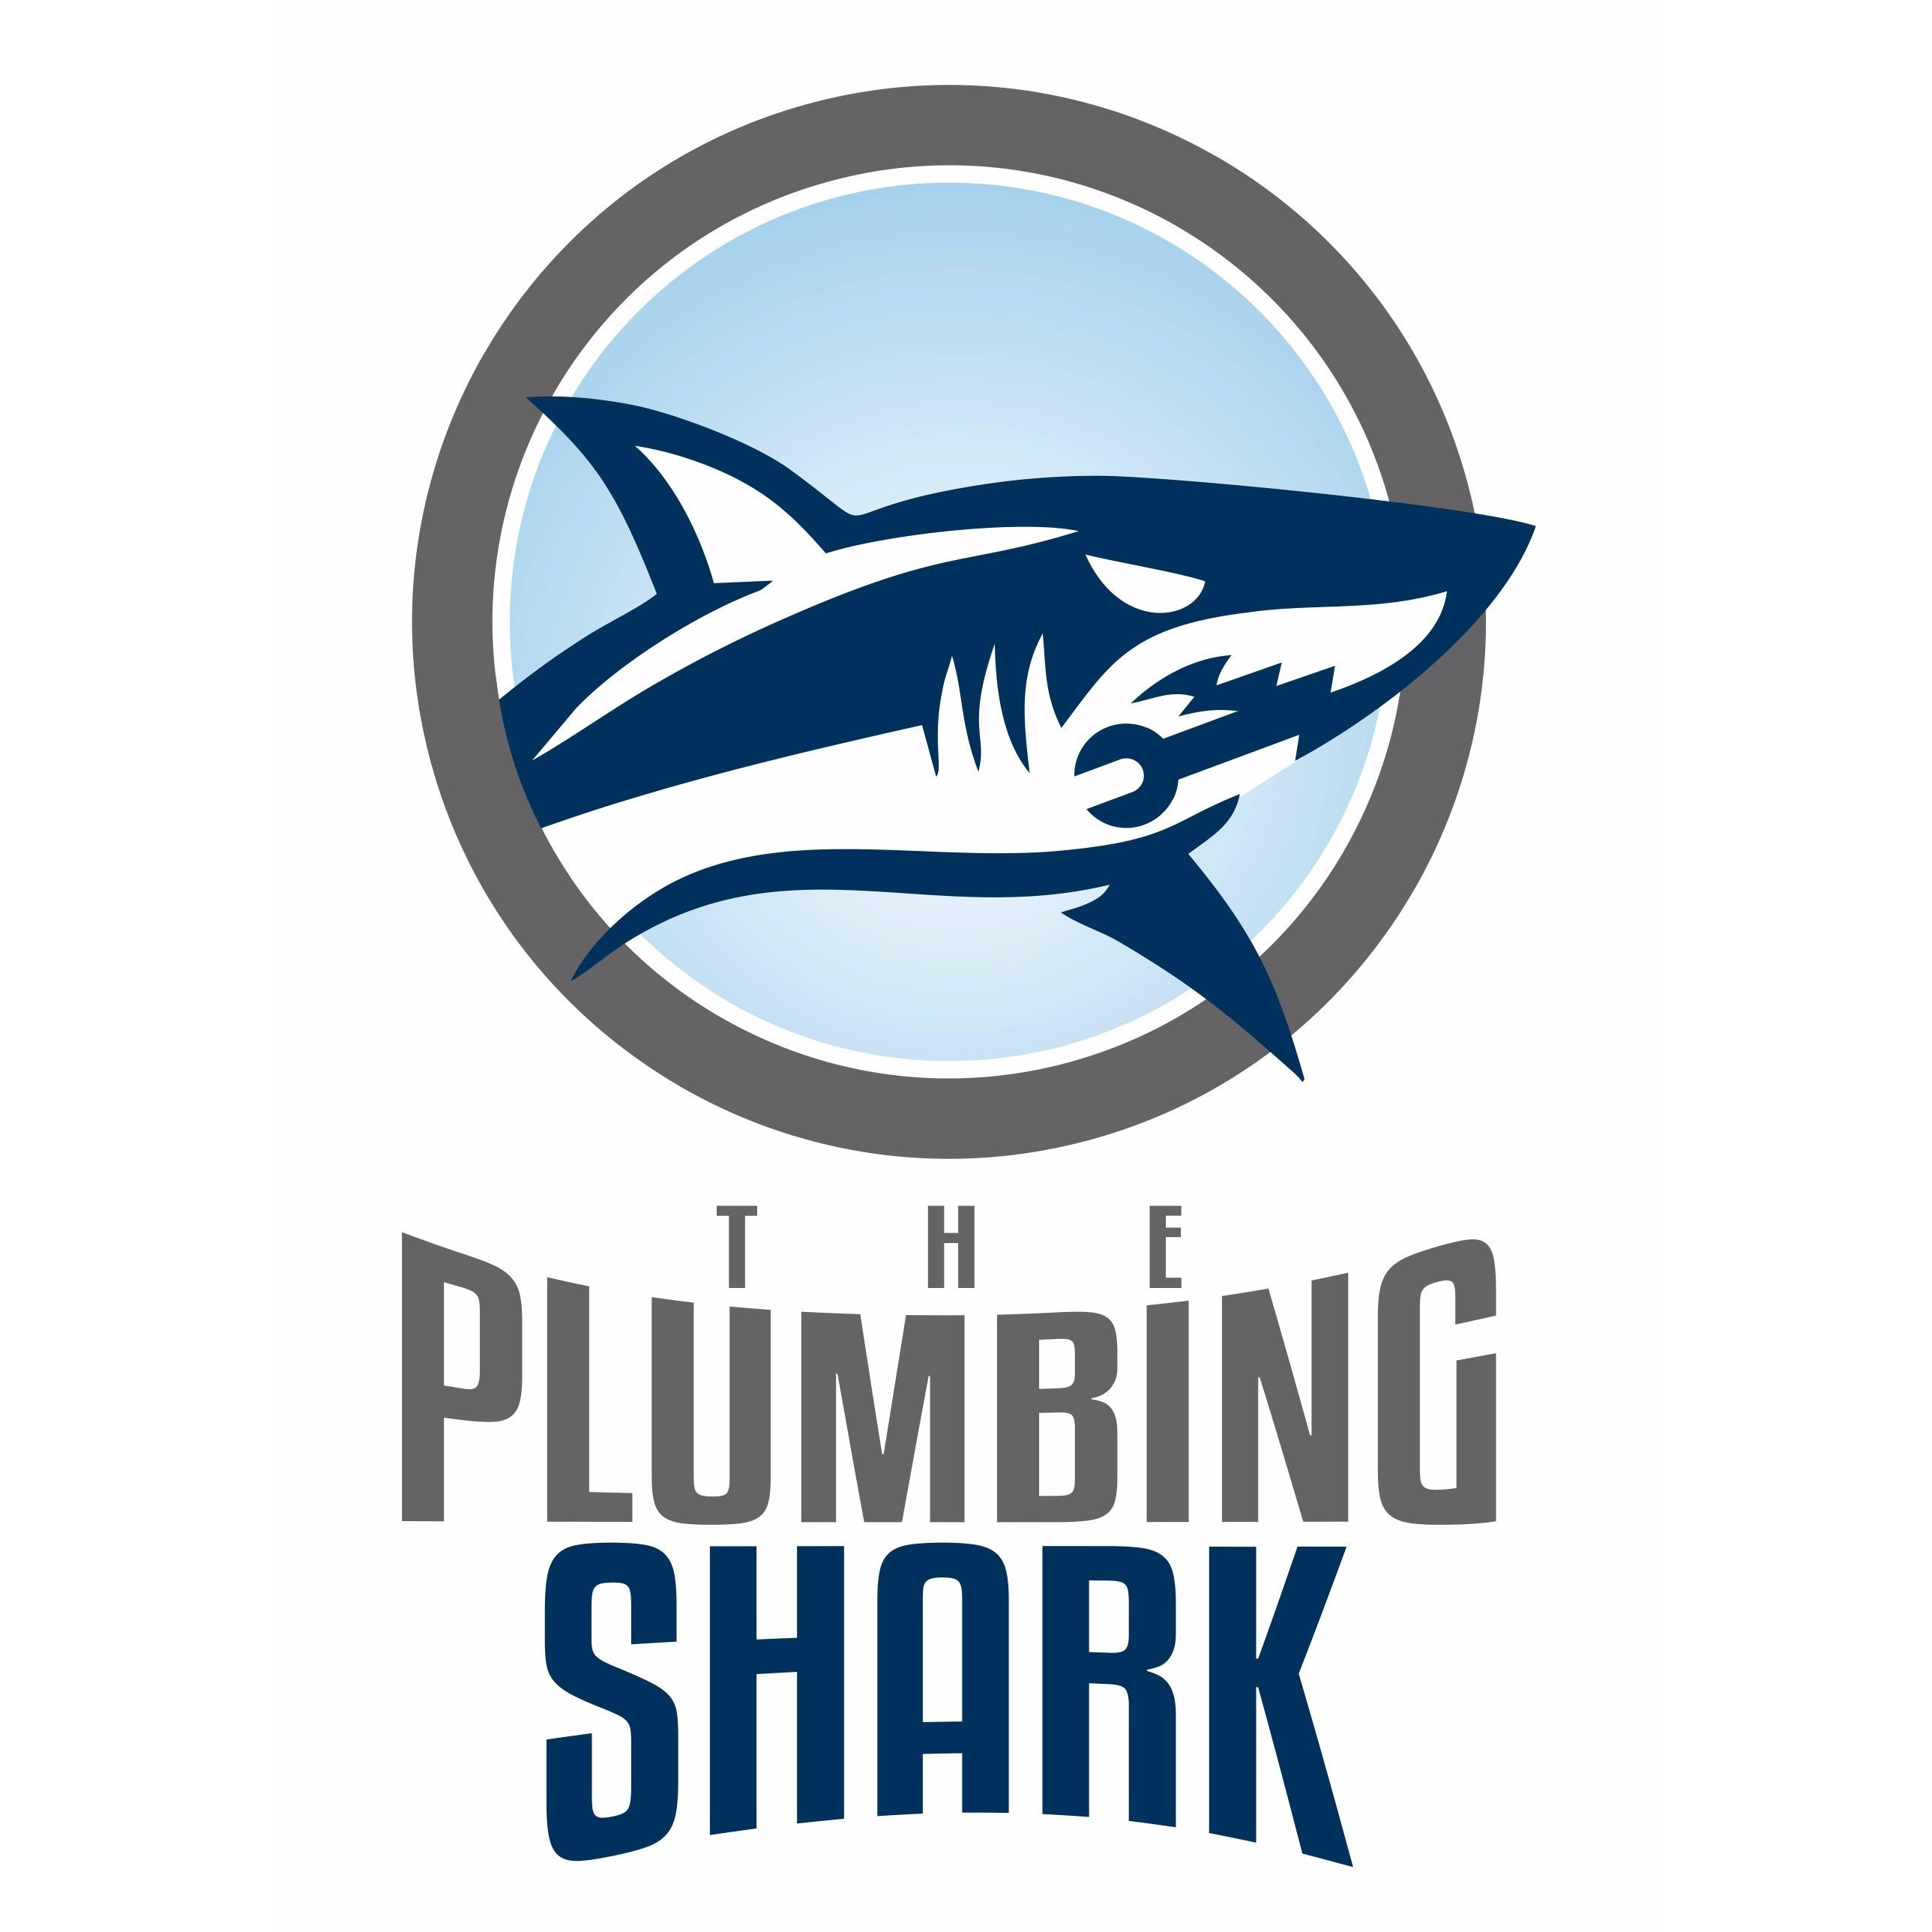 THE PLUMBING SHARK